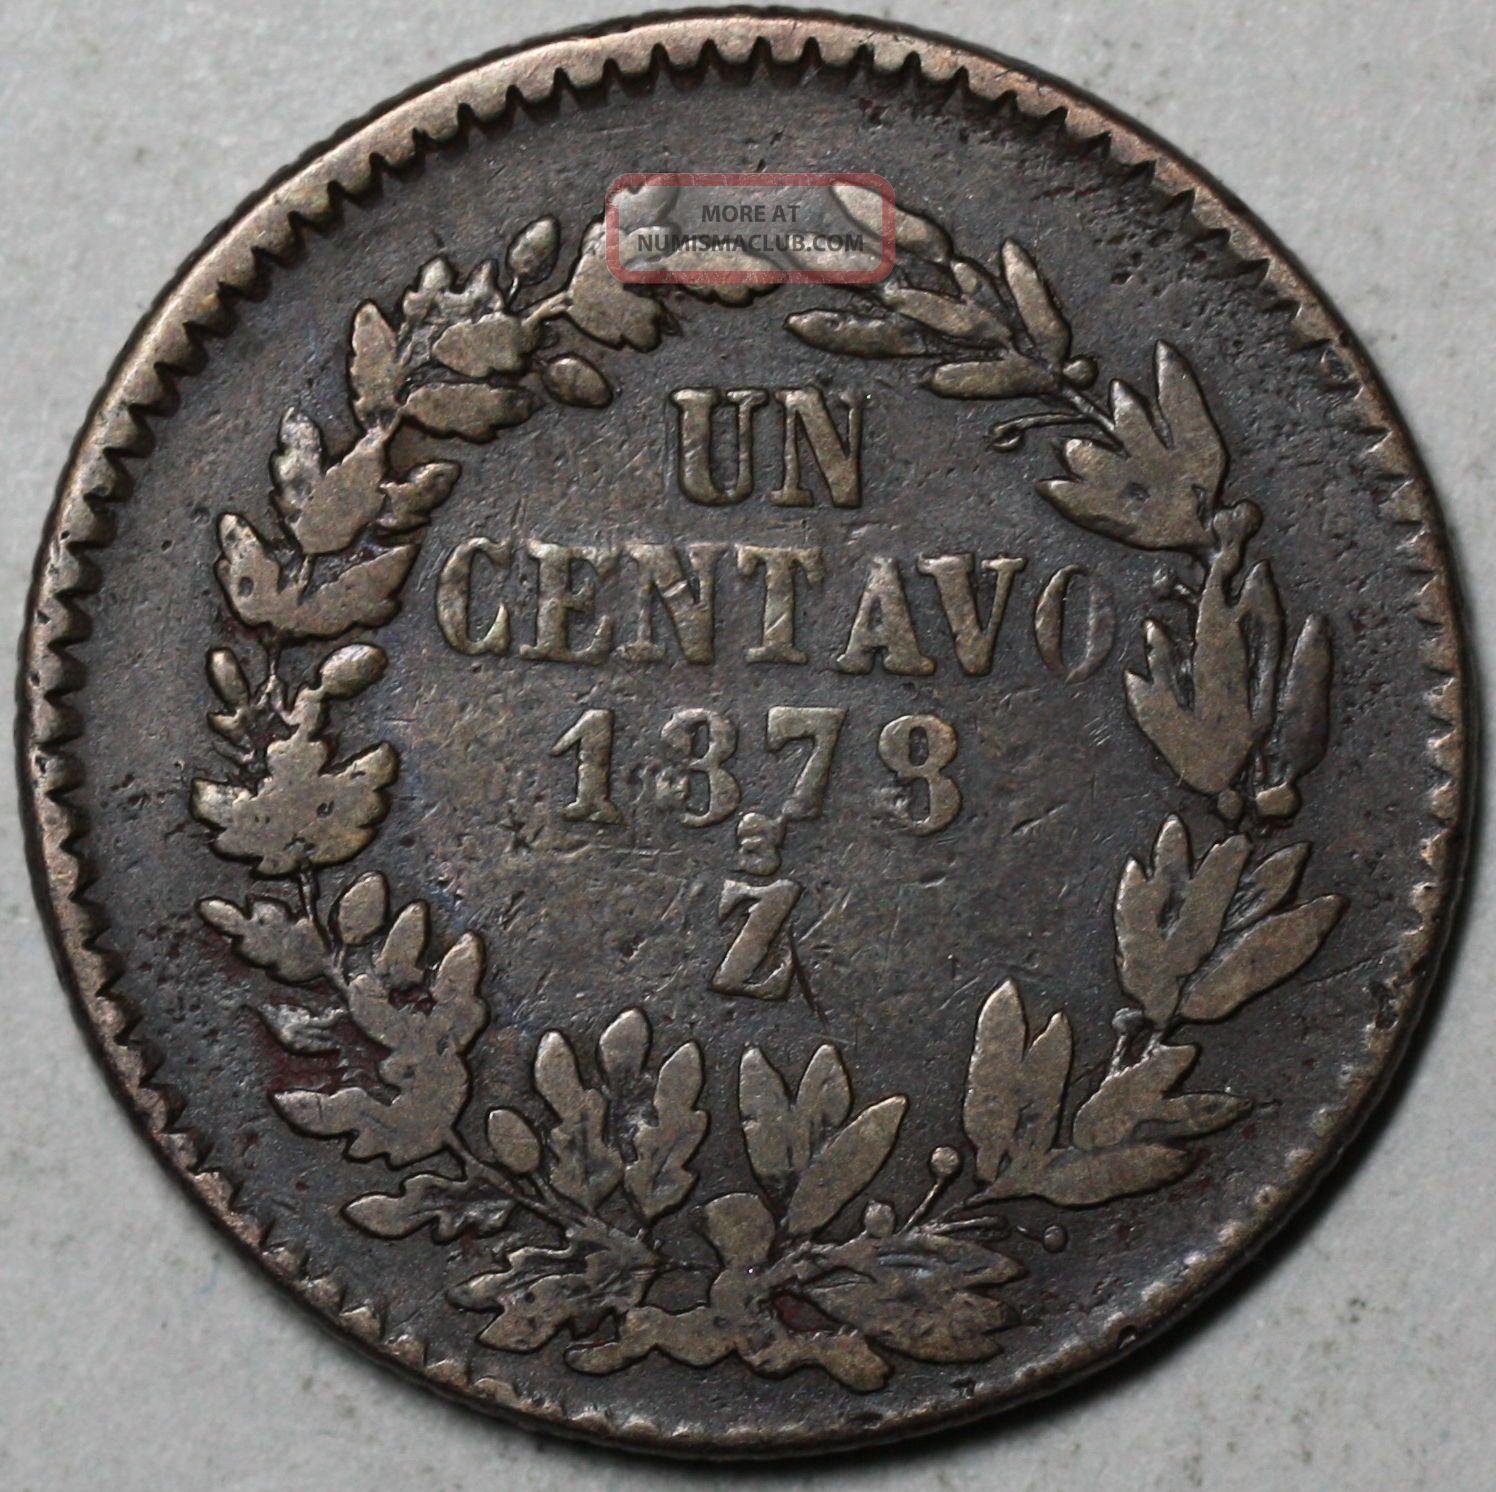 1878 Uncirculated Silver Dollar Authentic Us Morgan Silver